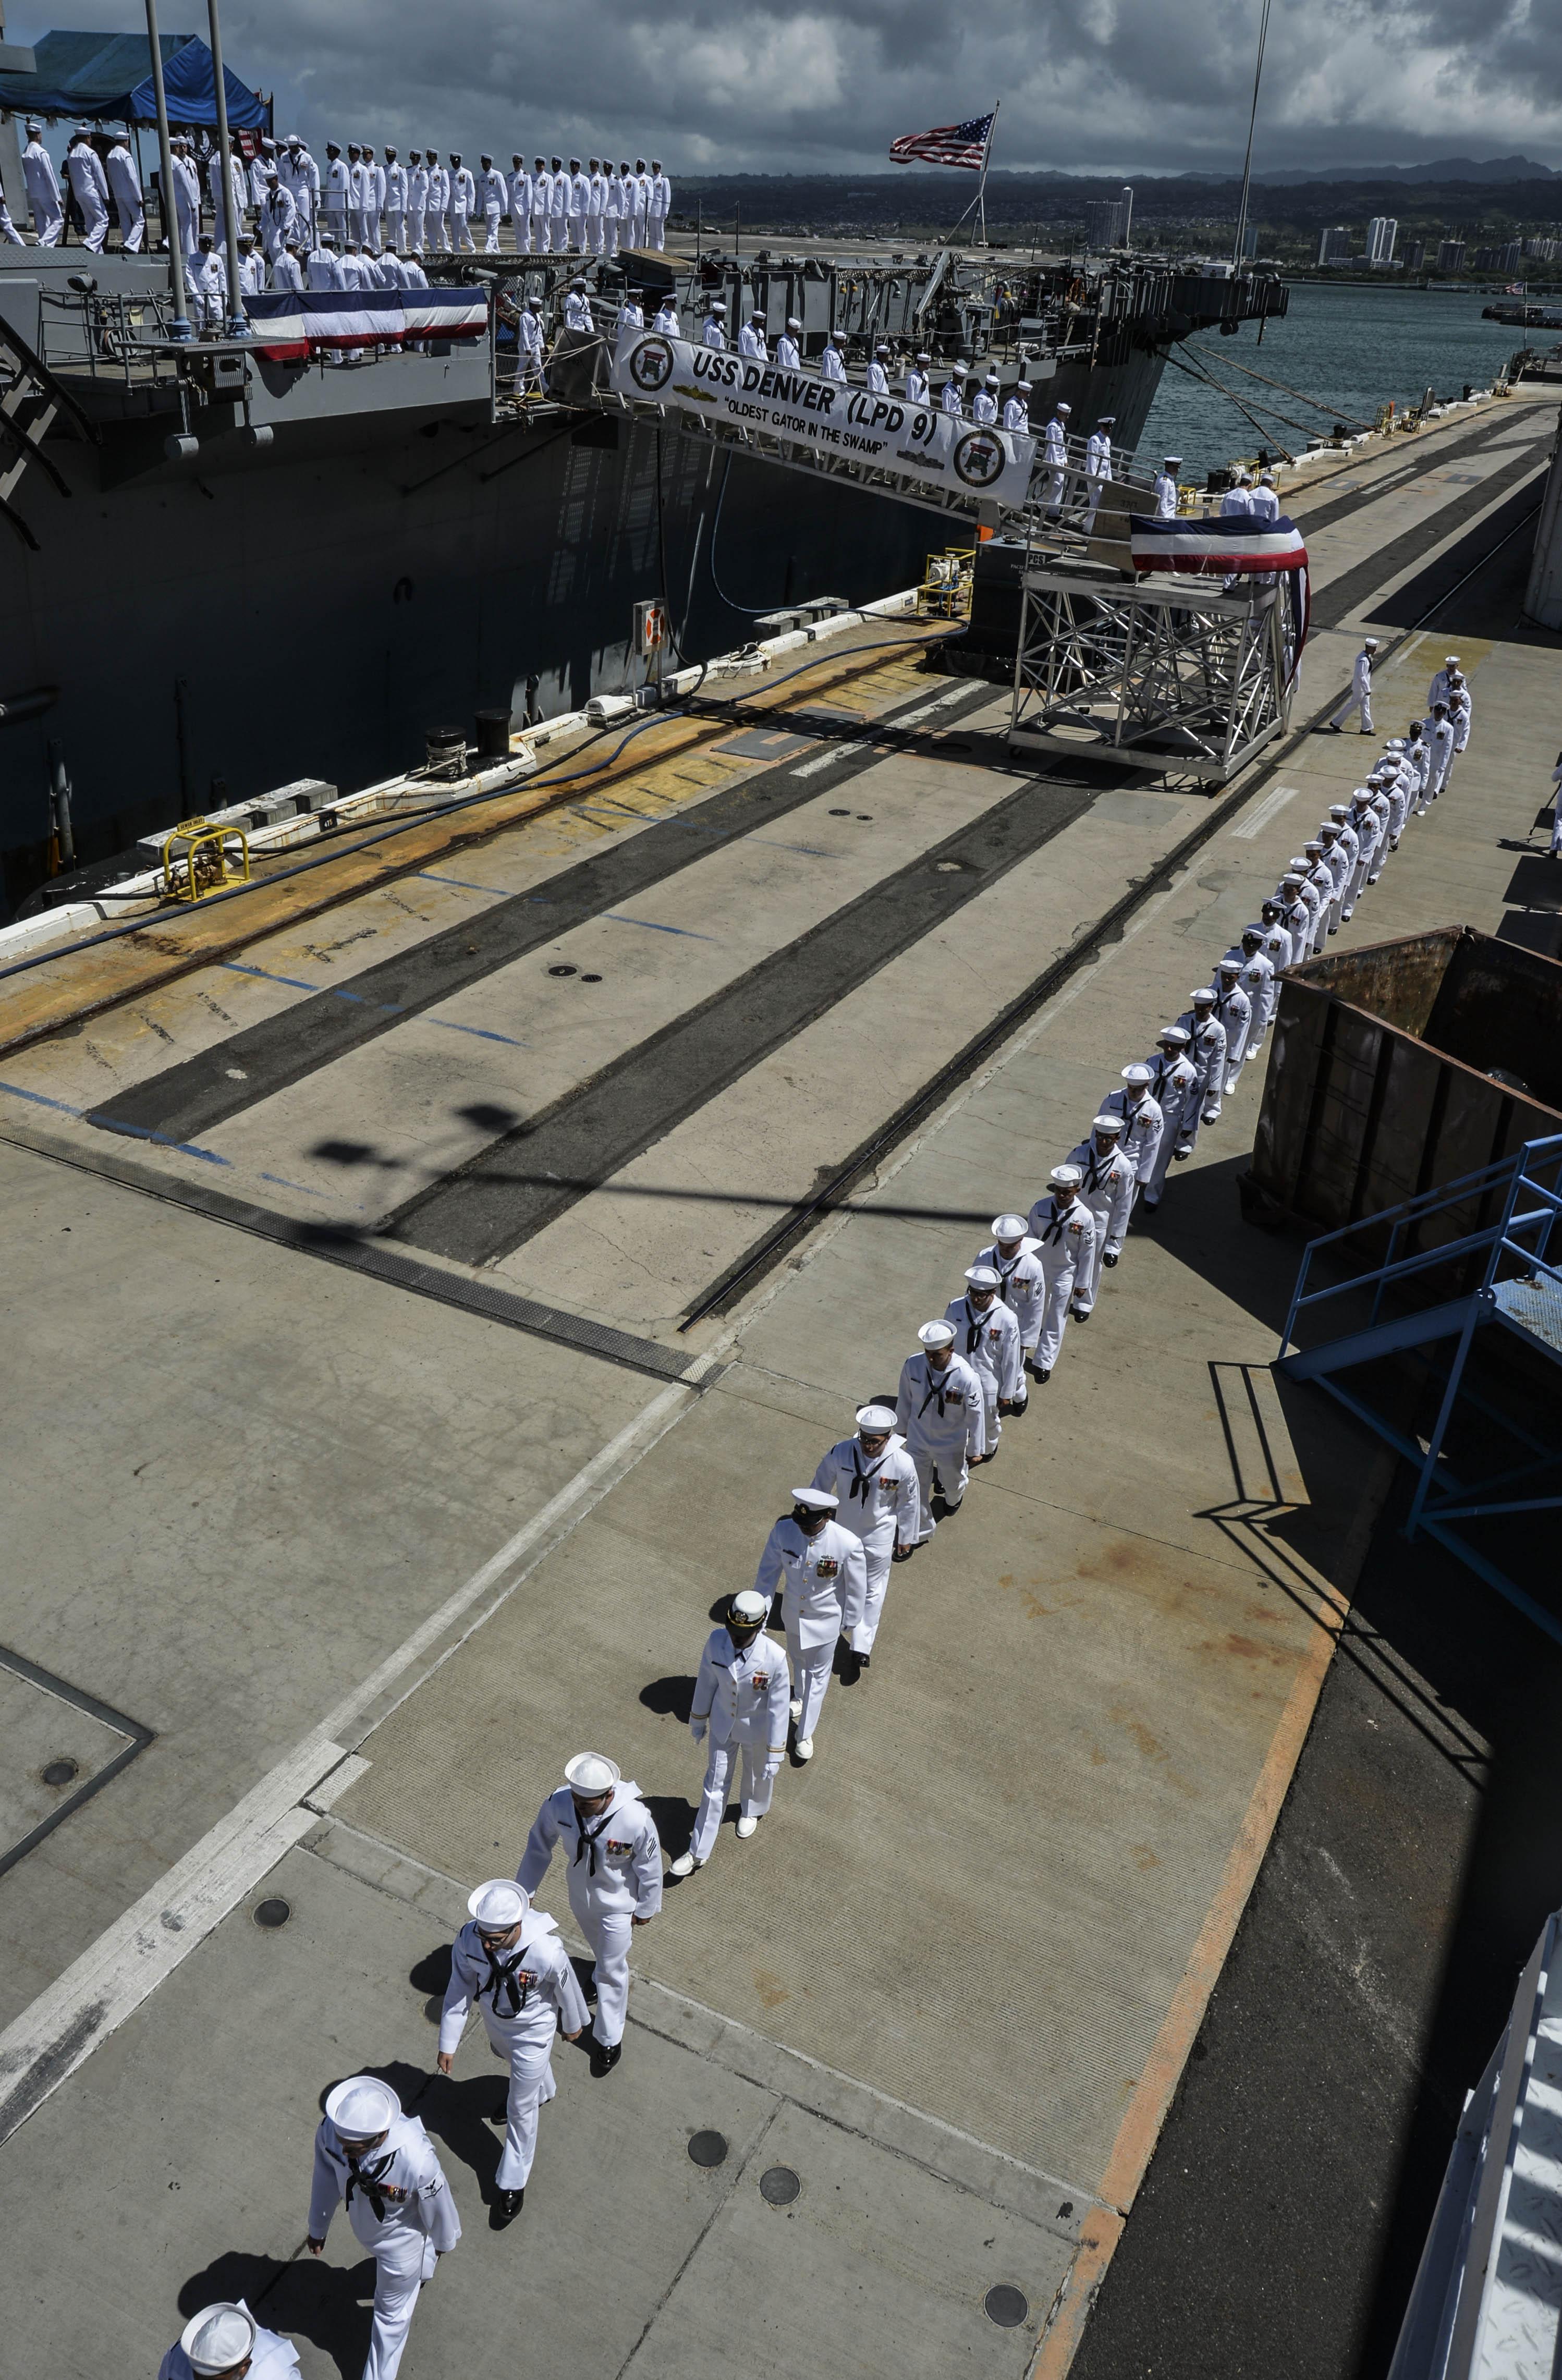 USS DENVER LPD-9 Decommissioning Ceremony Bild: U.S. Navy